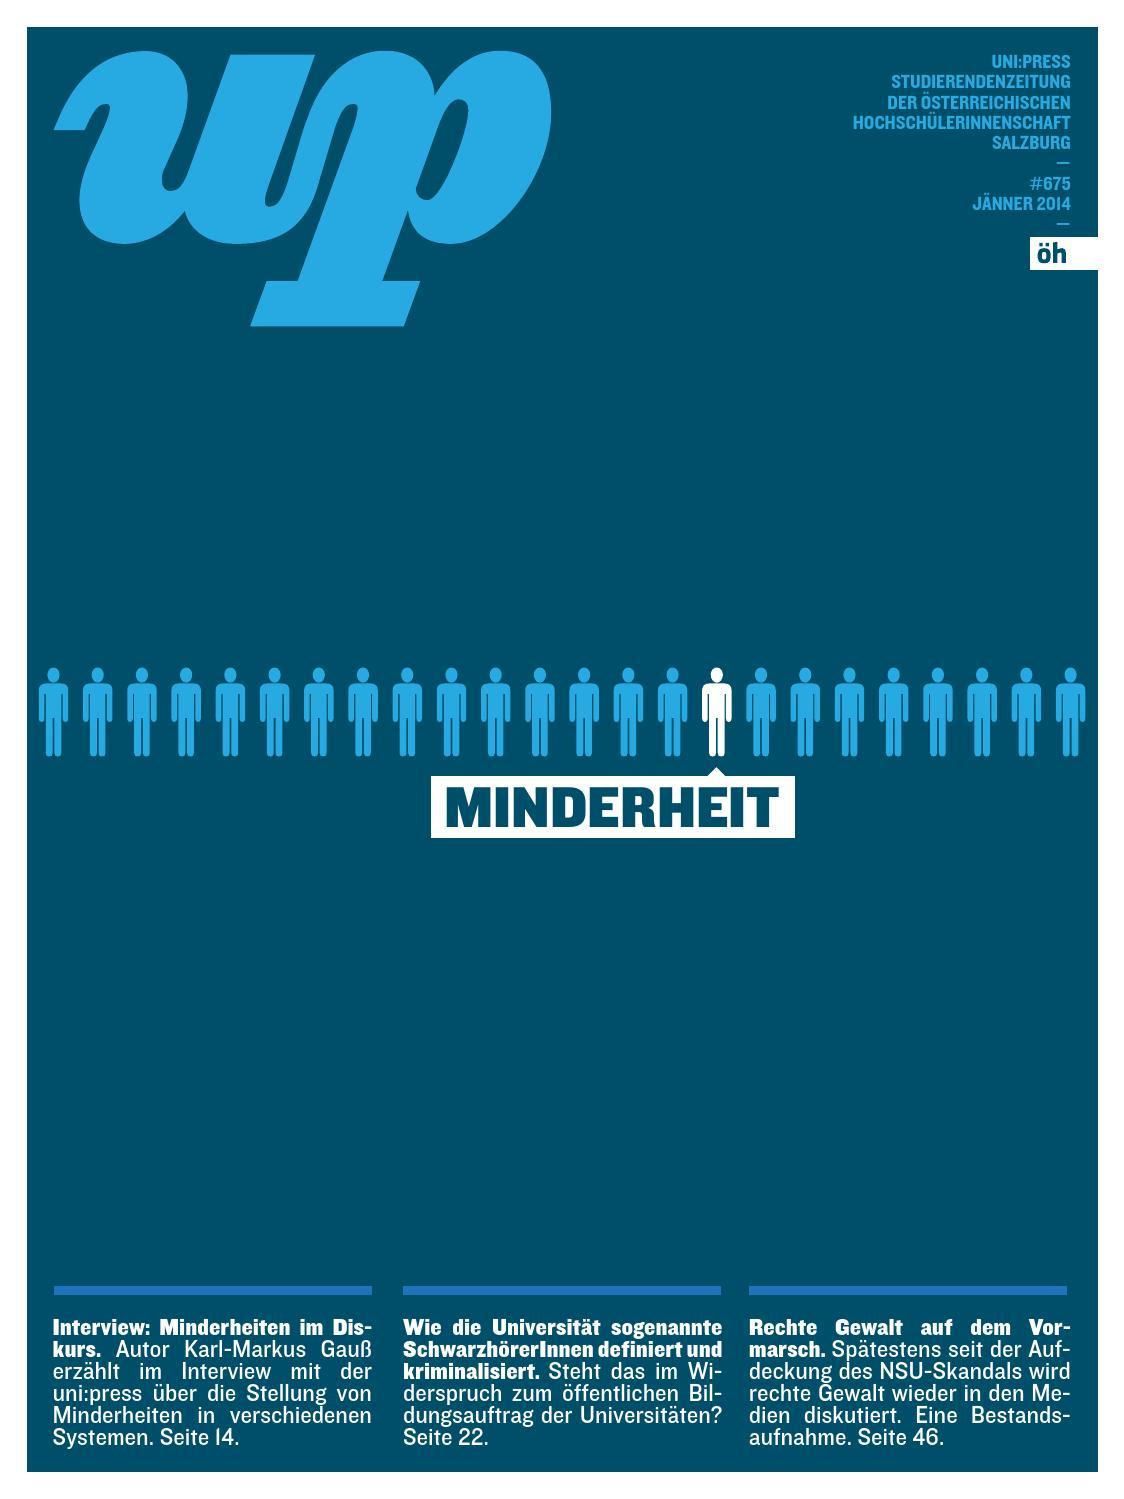 Uni:Press #675 (Jänner 2014) by uni:press (ÖH Salzburg) - issuu